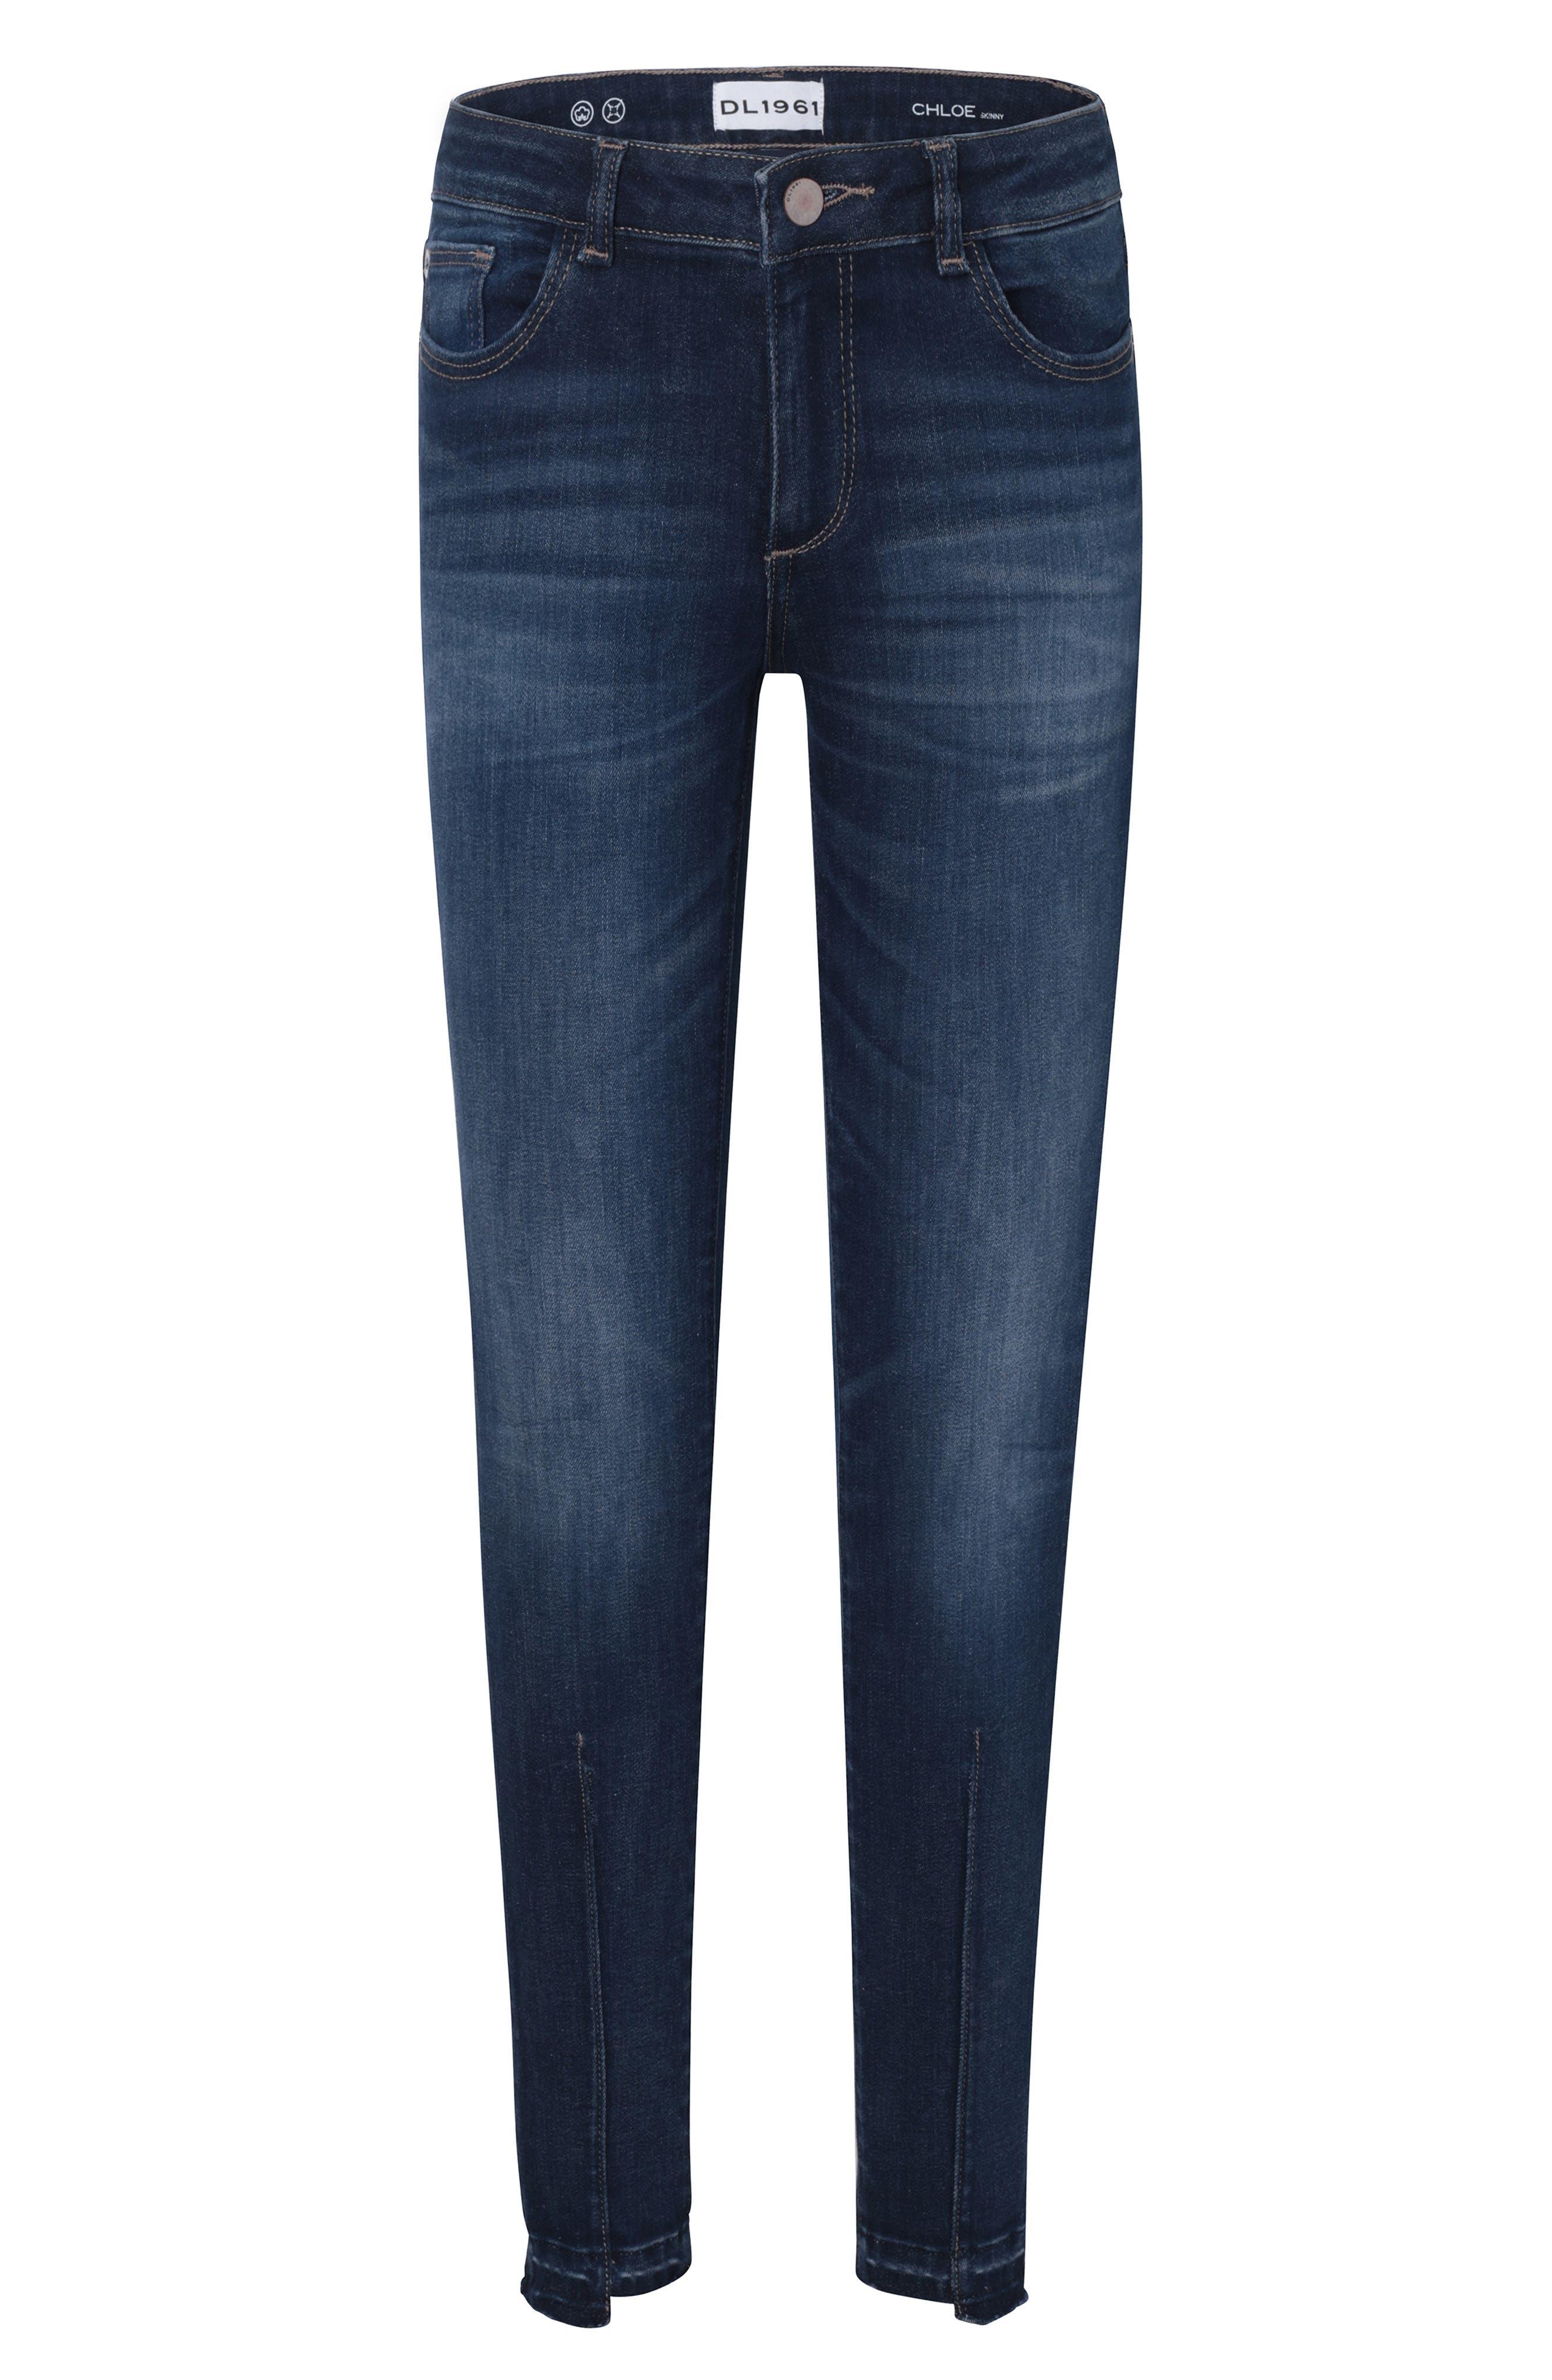 Chloe Step Hem Stretch Denim Skinny Jeans,                             Main thumbnail 1, color,                             LIMELIGHT